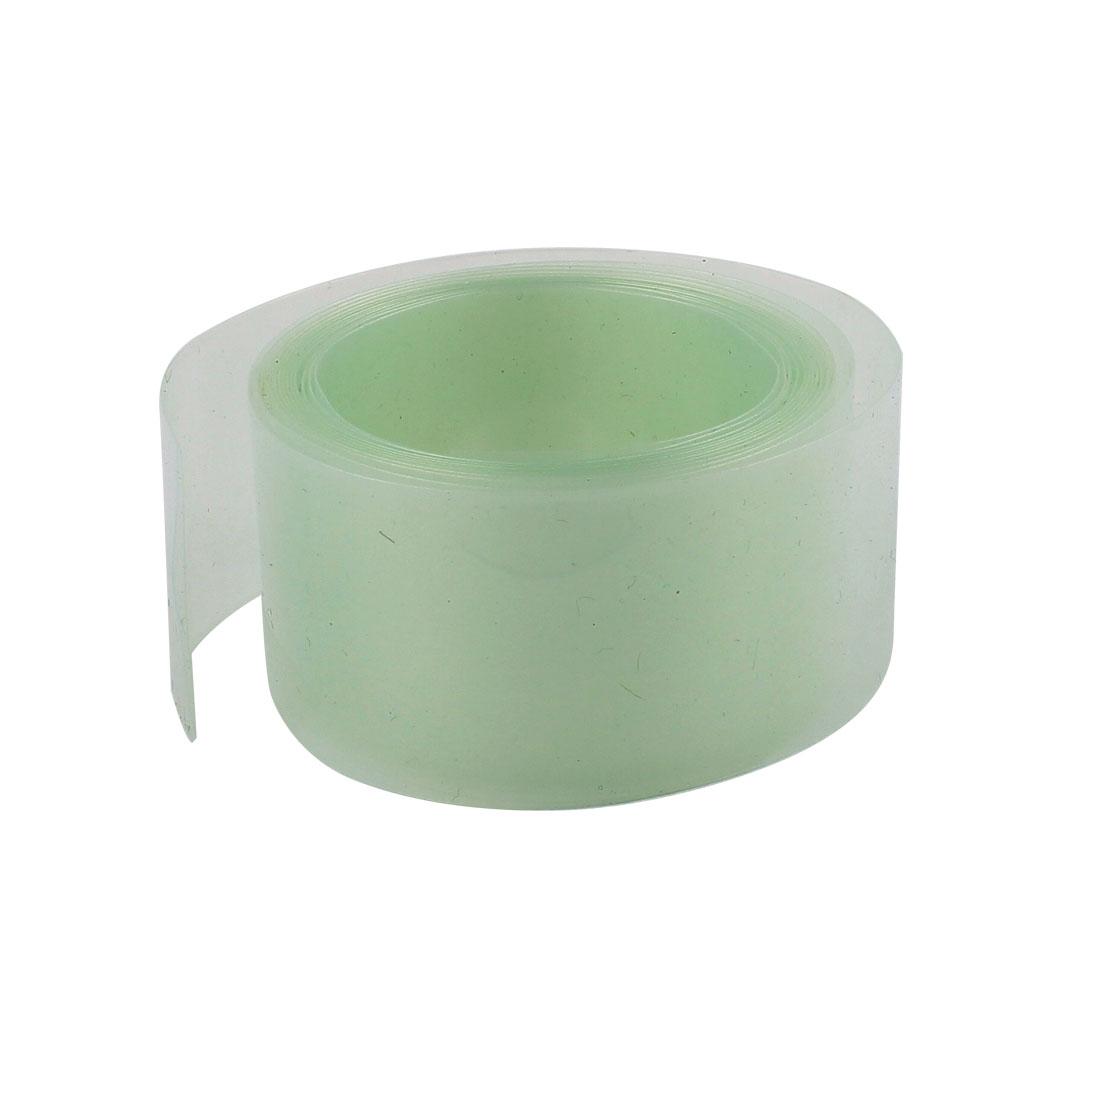 6.5ft 18.5mm Dia Transparent PVC Heat Shrink Tubing Battery Protective Tube